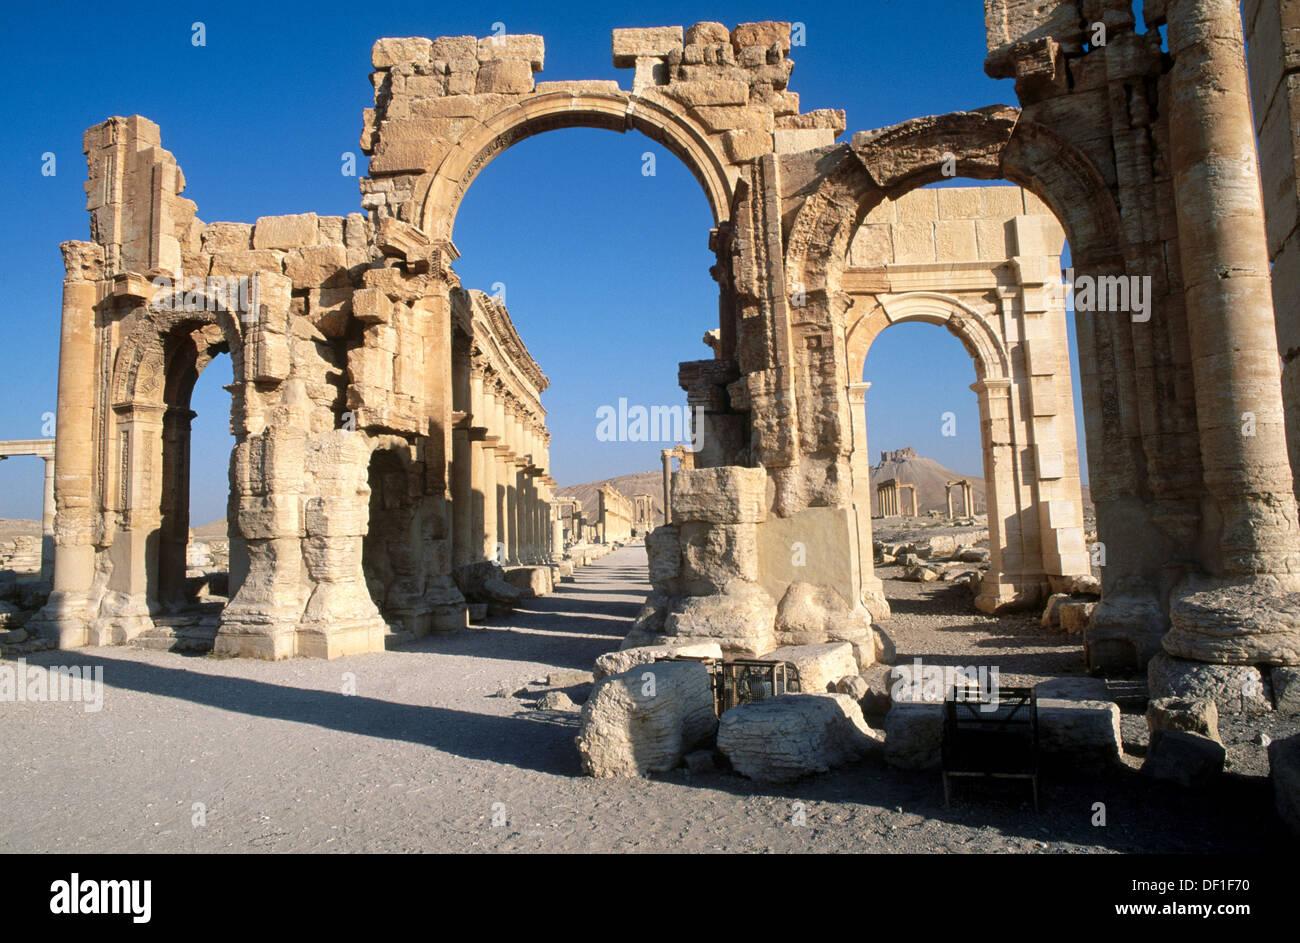 Triumphal arch and main street. Greco-Roman city. Palmyra. Syria - Stock Image